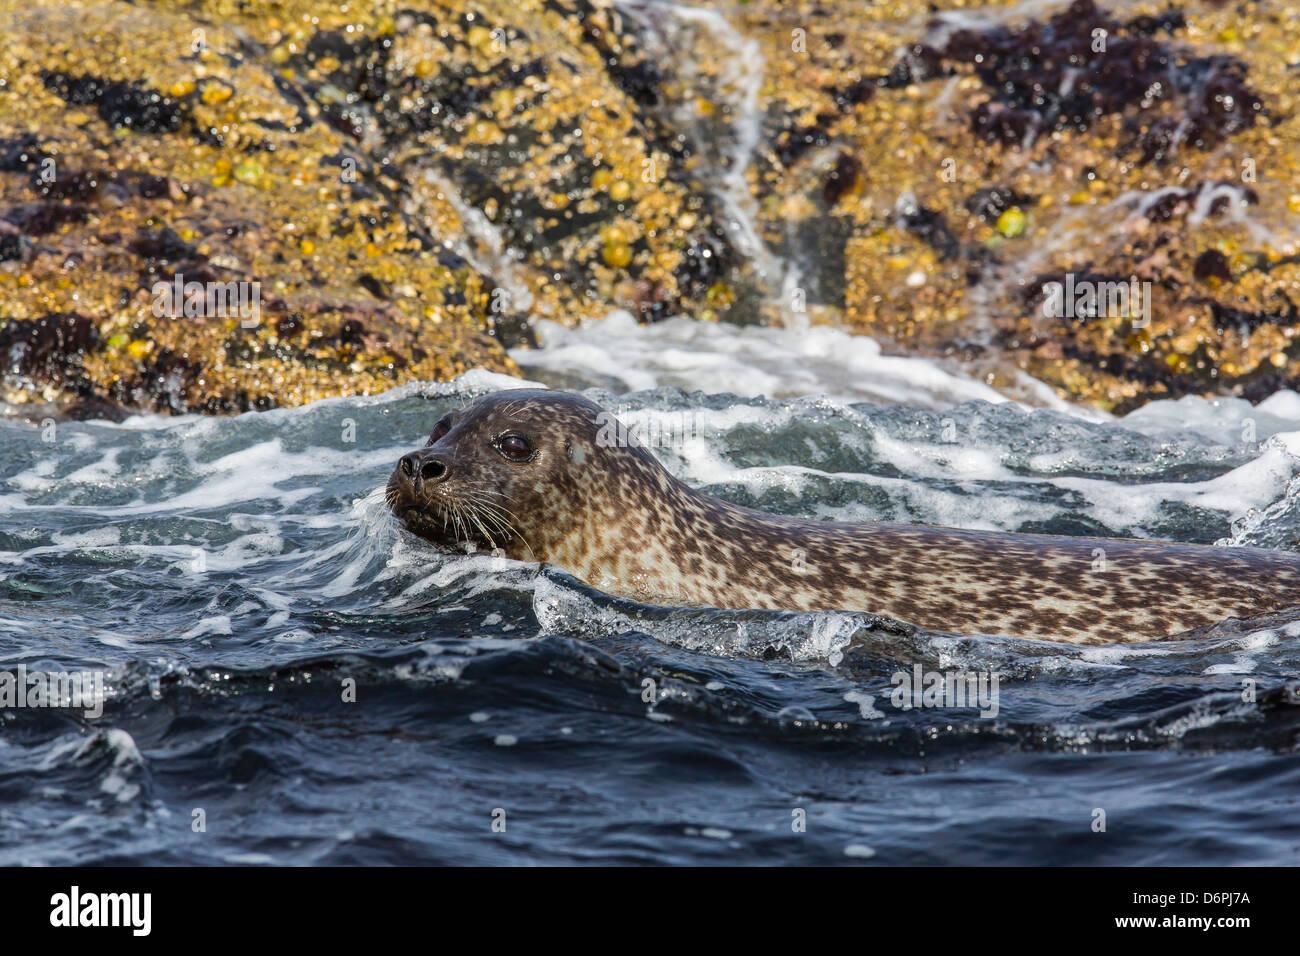 Harbour seal (common seal) (Phoca vitulina), Foula Island, Shetlands, Scotland, United Kingdom, Europe - Stock Image